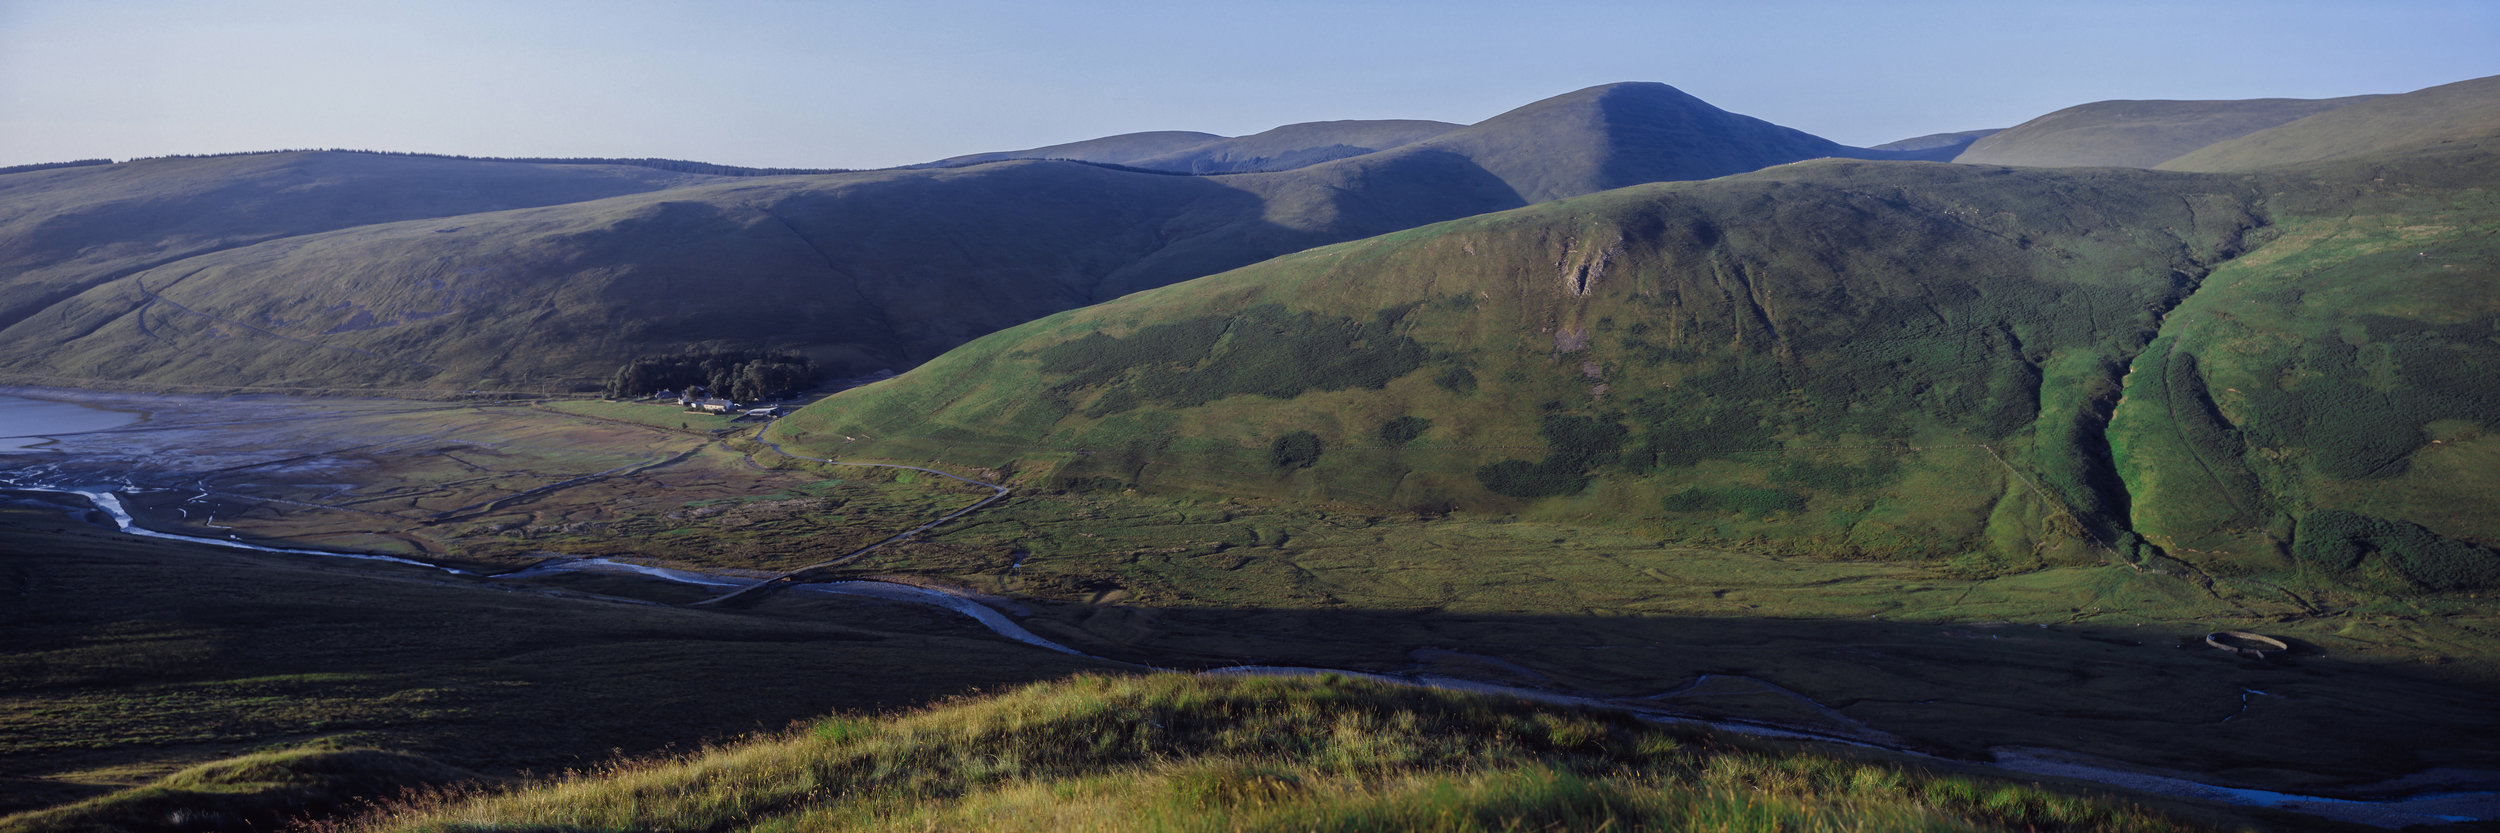 lowland panoramas - the stunning Lowland Scottish Landscape in Panoramic..